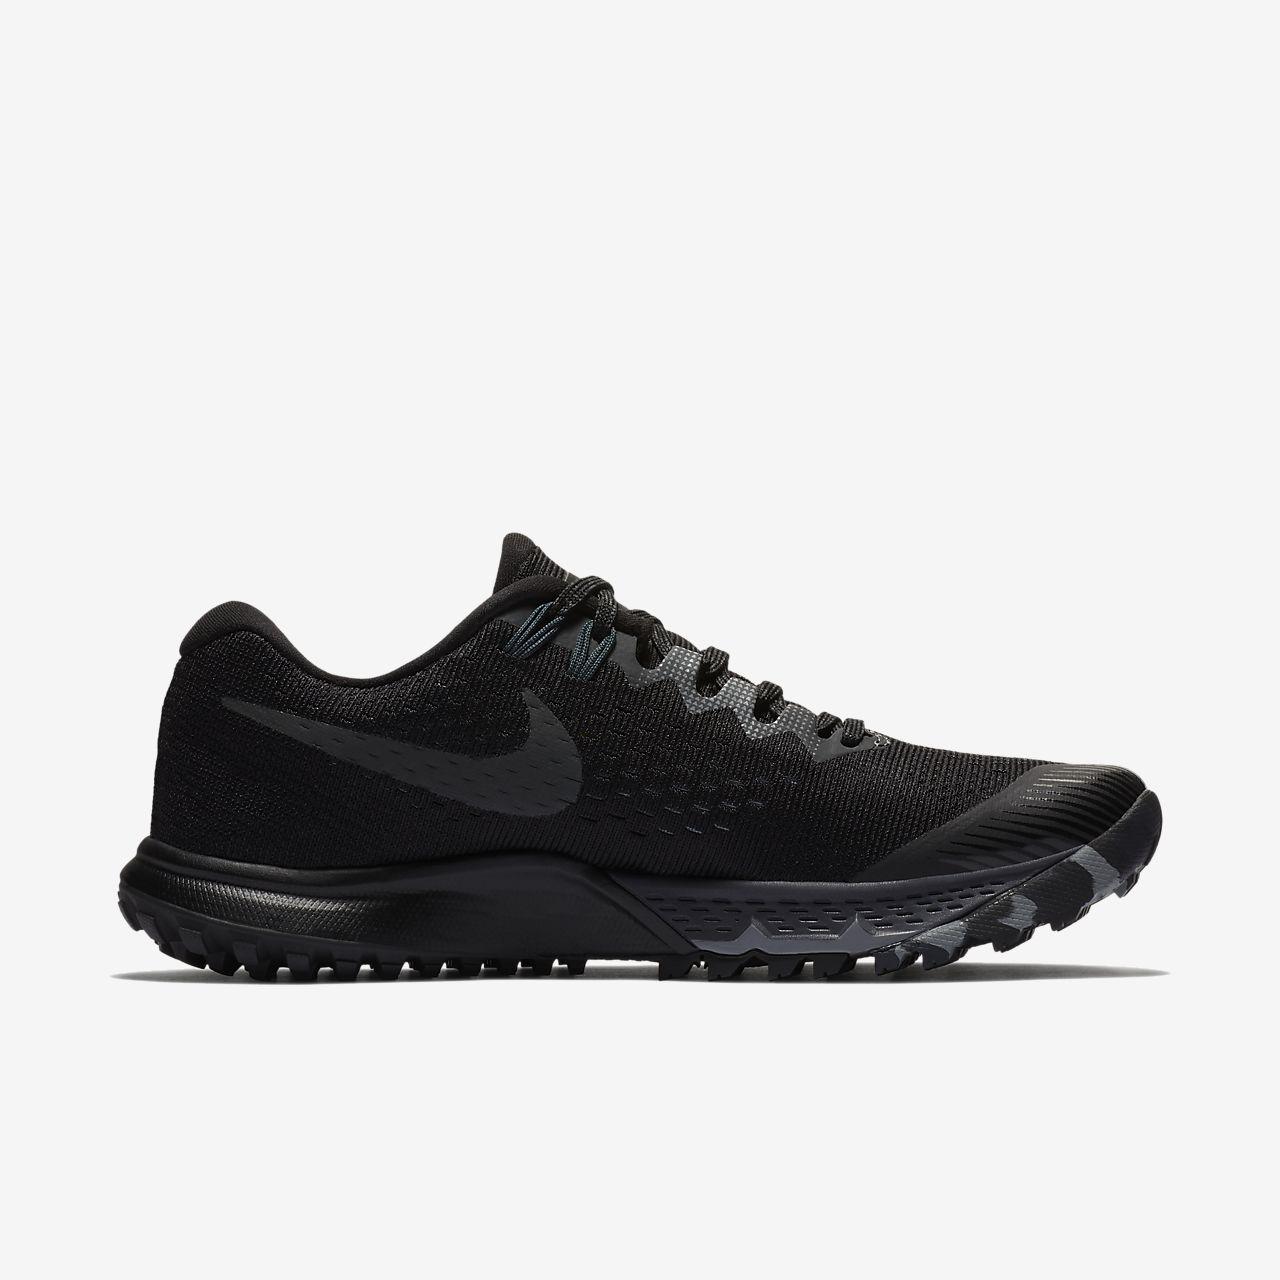 002b48df1e64f5 Nike Air Zoom Terra Kiger 4 Women s Running Shoe. Nike.com